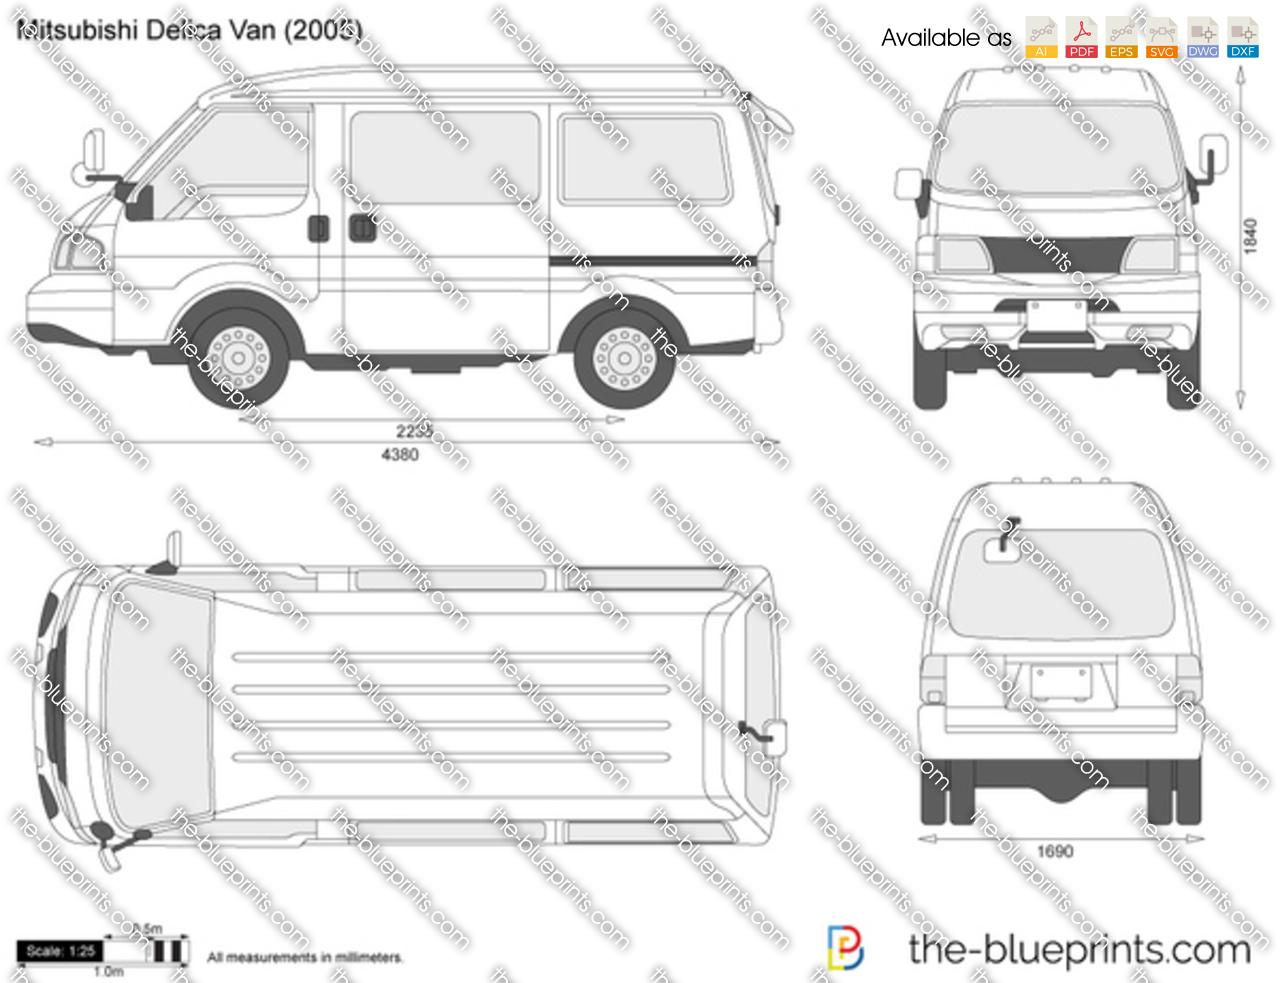 Mitsubishi Delica Van 2007